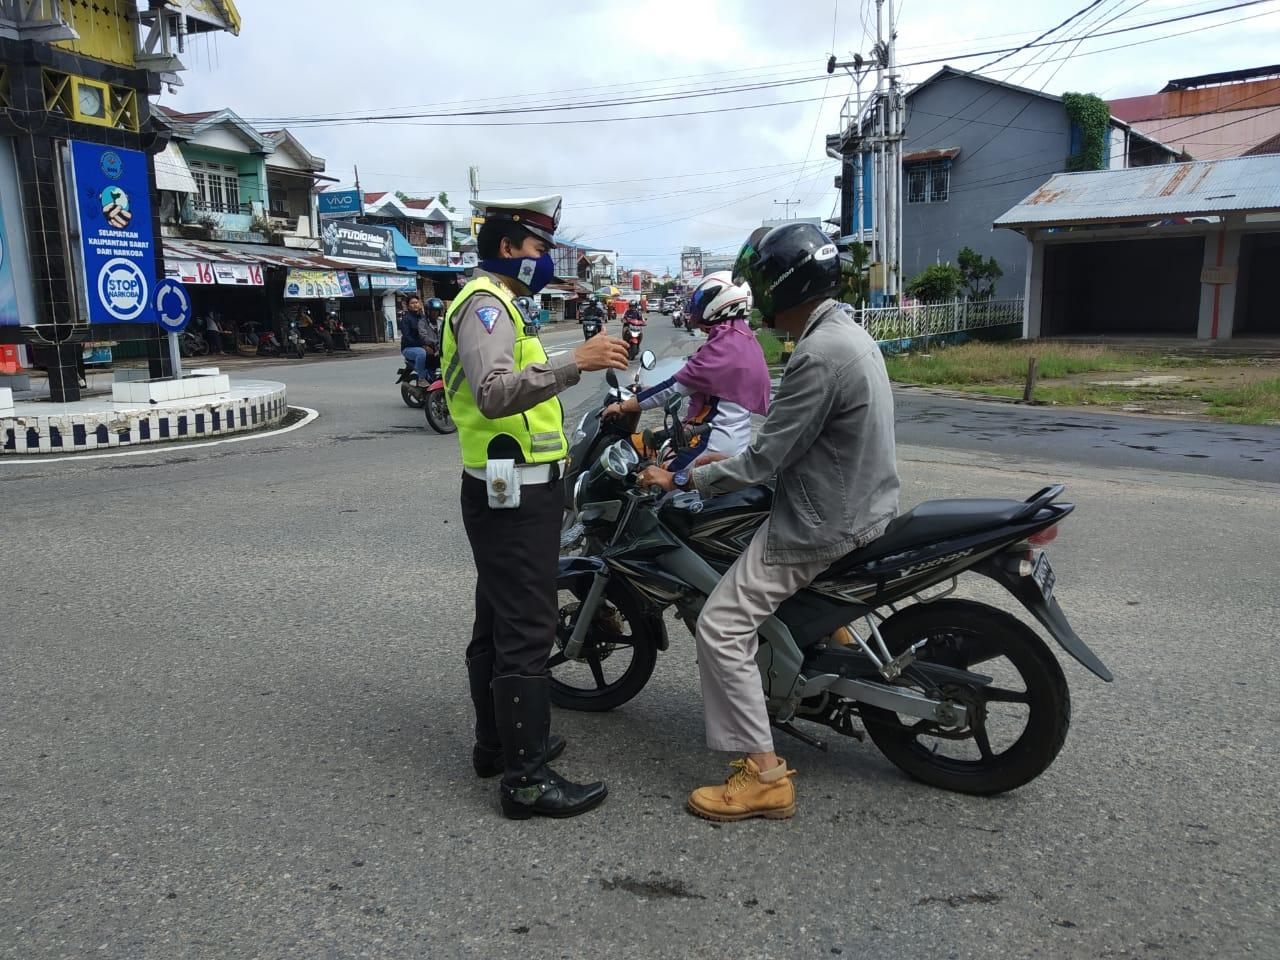 Satlantas Gelar Operasi Ketupat di Jalan Raya Kabupaten Ketapang, Ingatkan Warga Pakai Masker